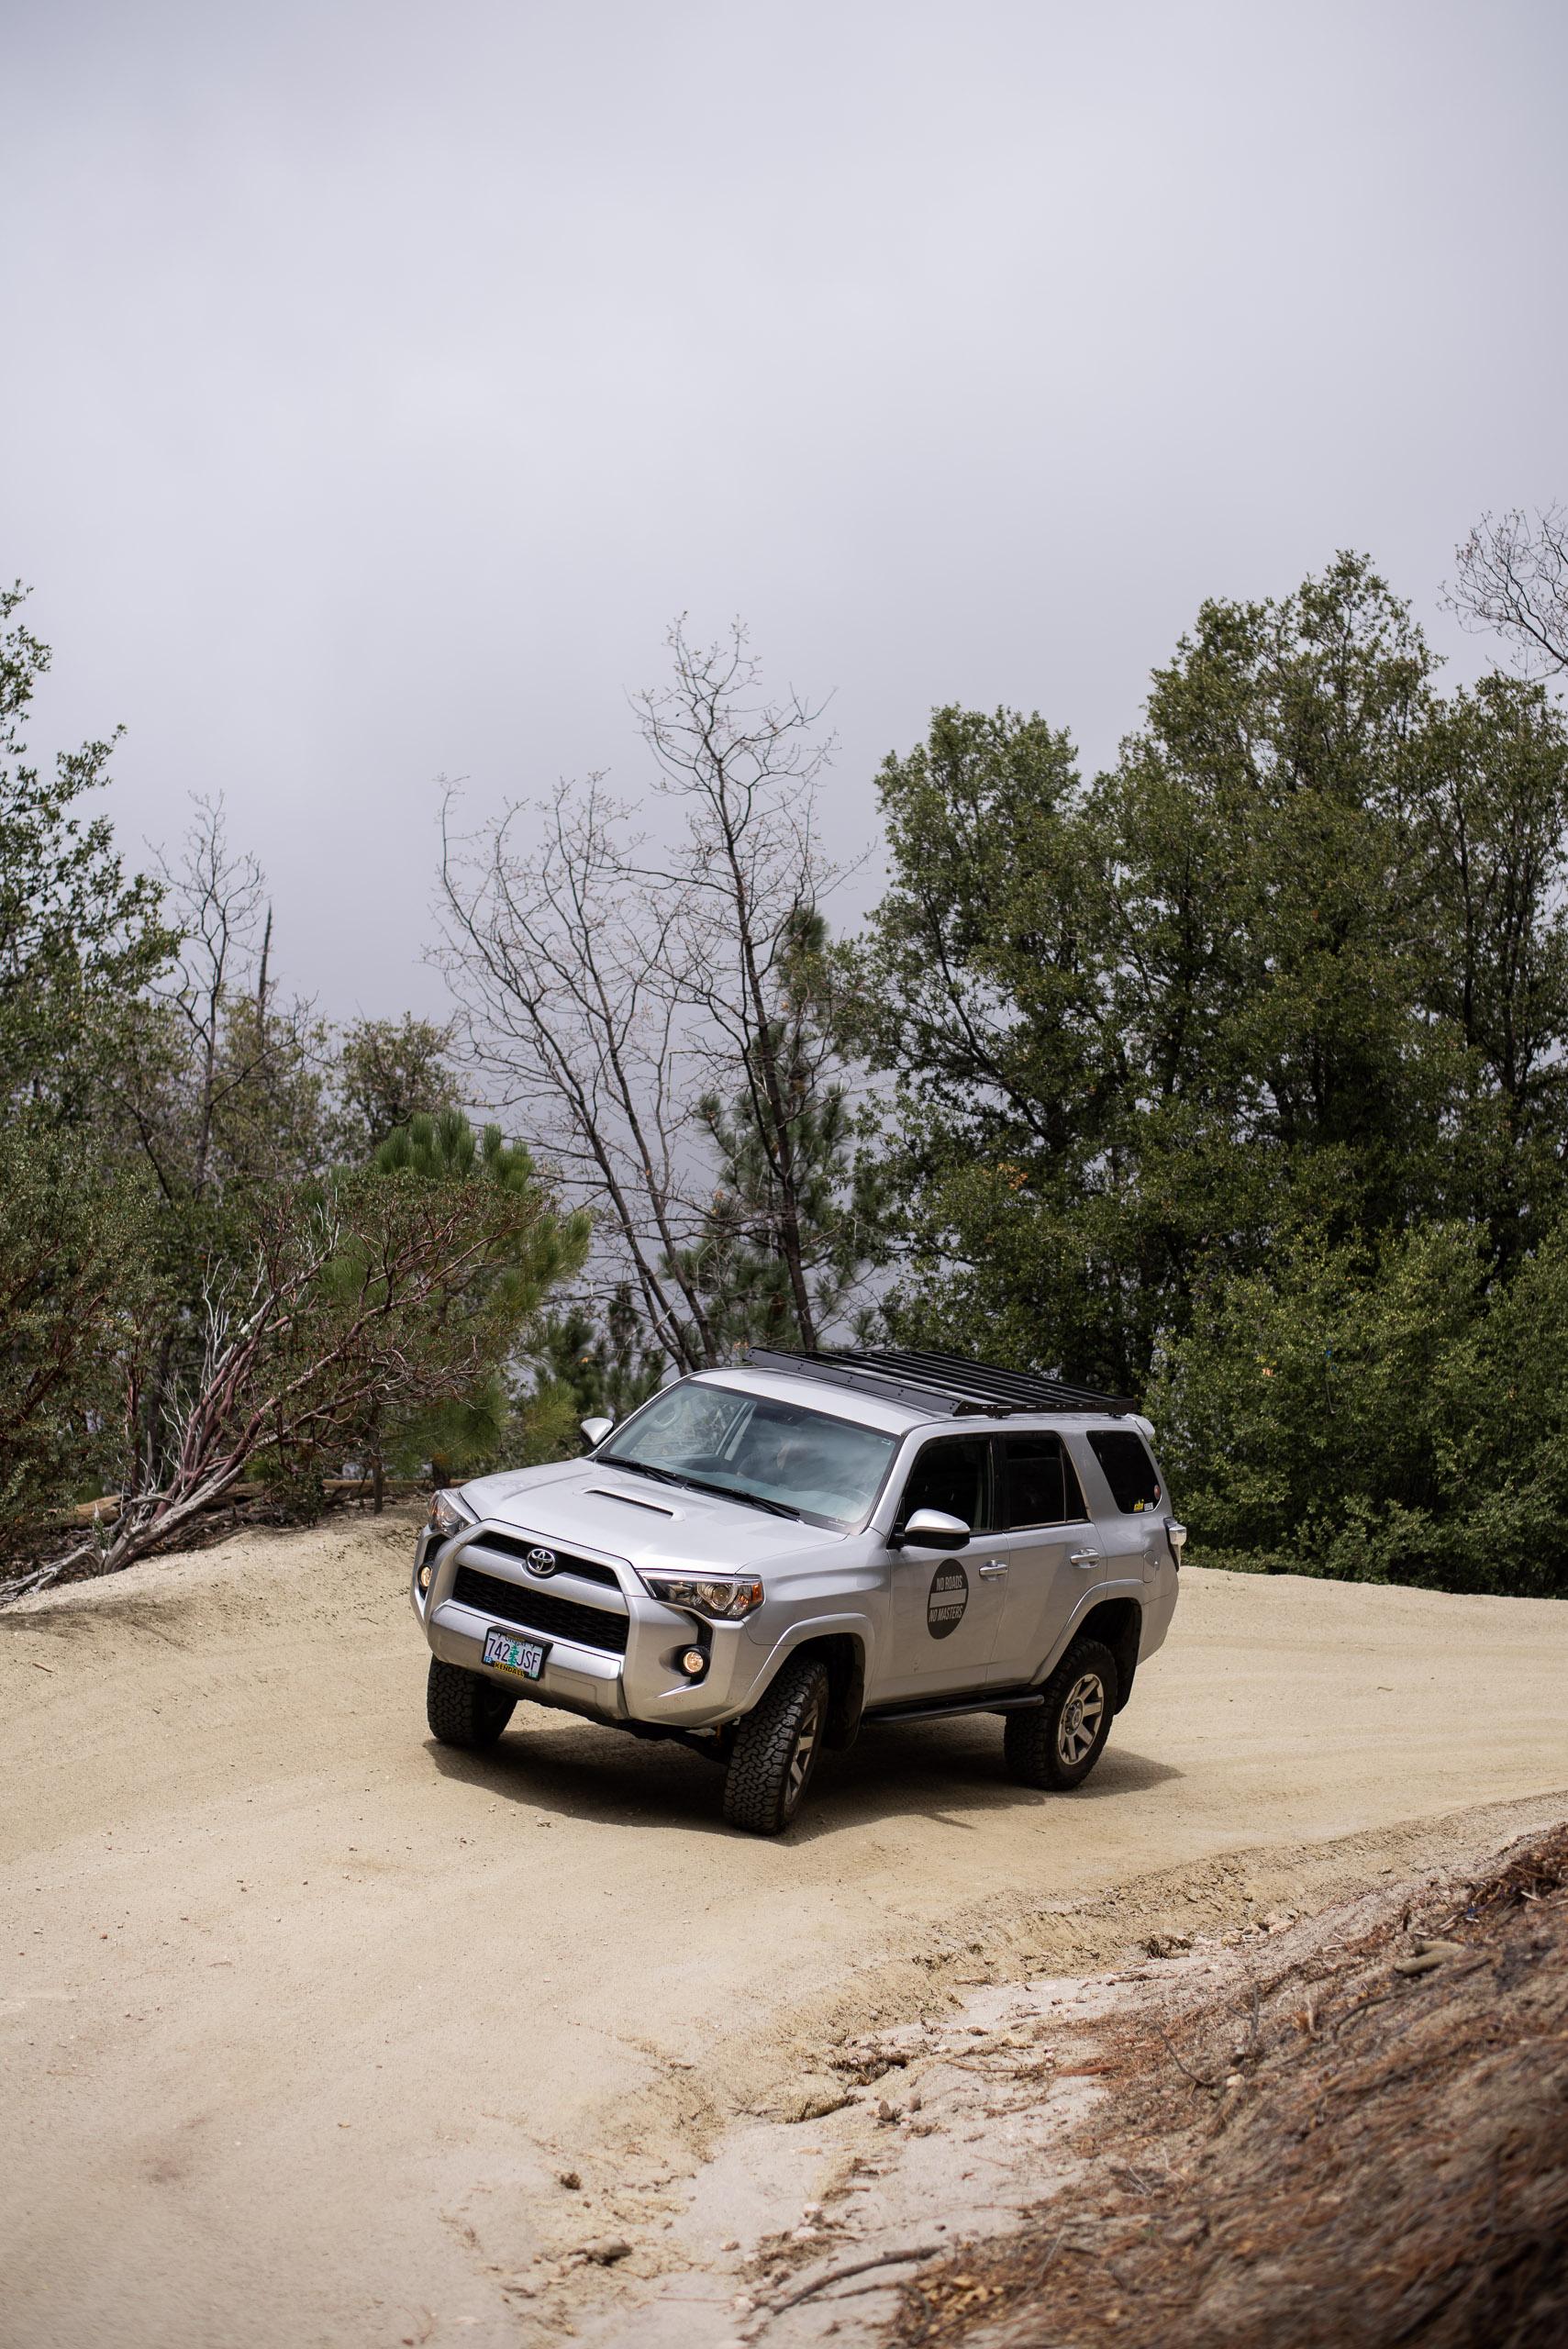 toyota-4runner-5th-gen-dirt-road-softroading